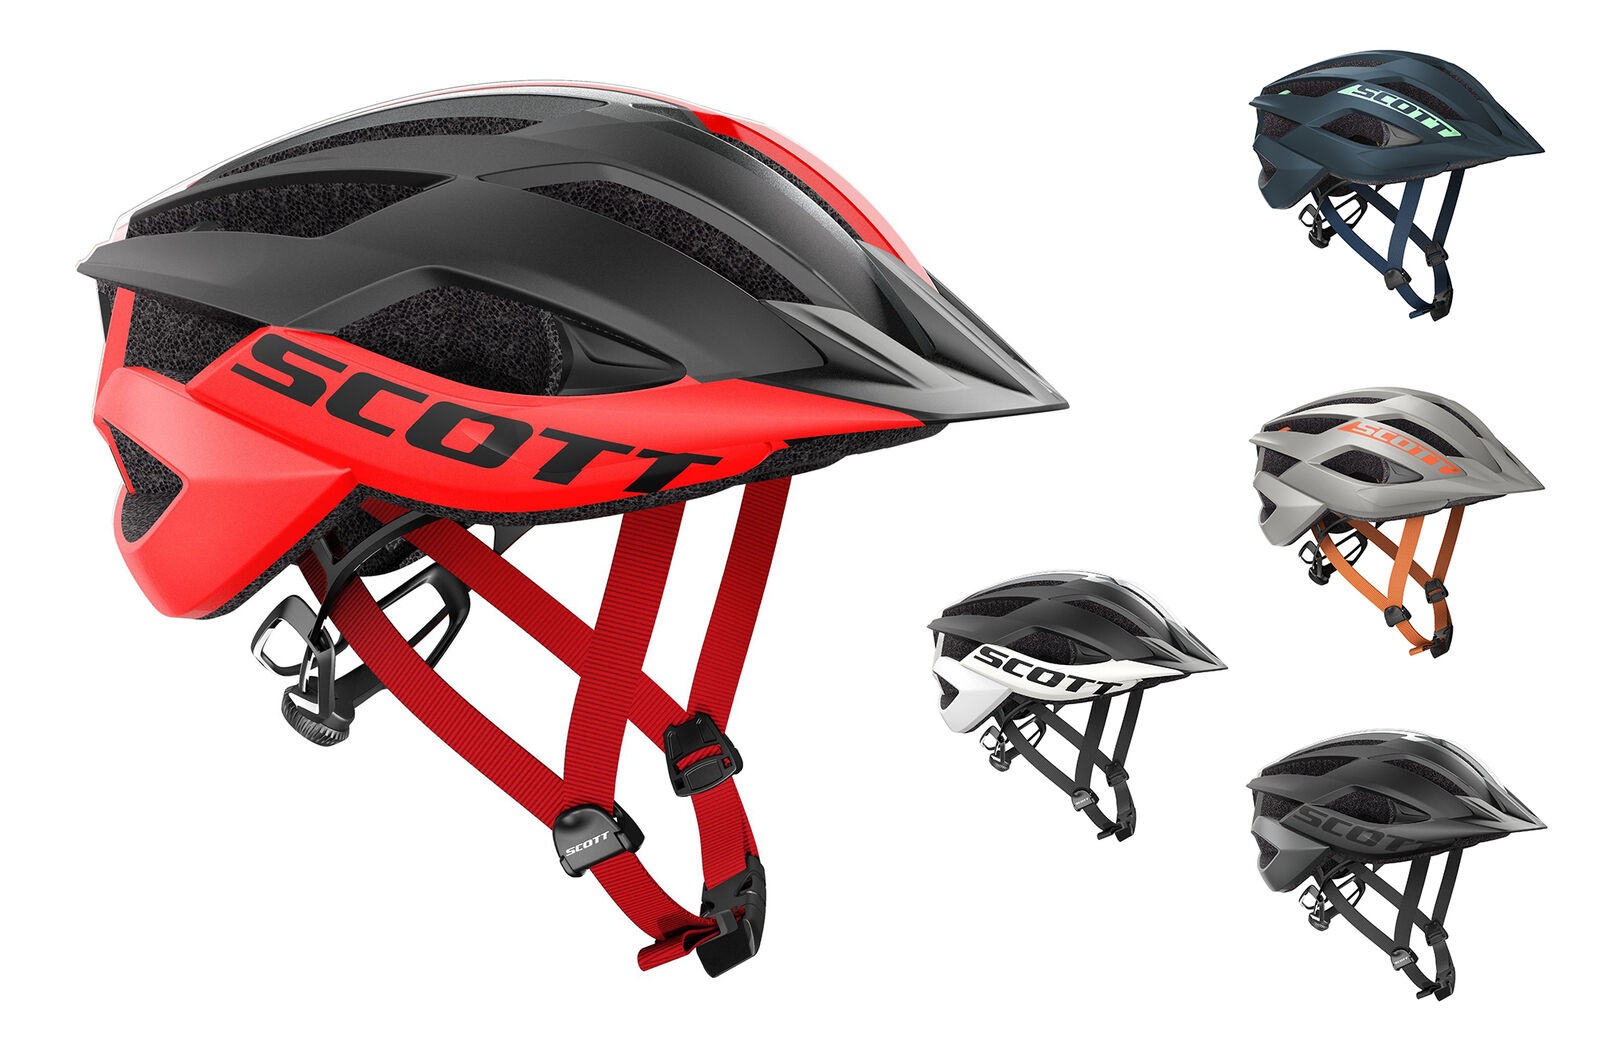 Scott Casco Bicicleta Arx MTB Plus Casco Casco de Mountainbike Bicicleta Radhelm